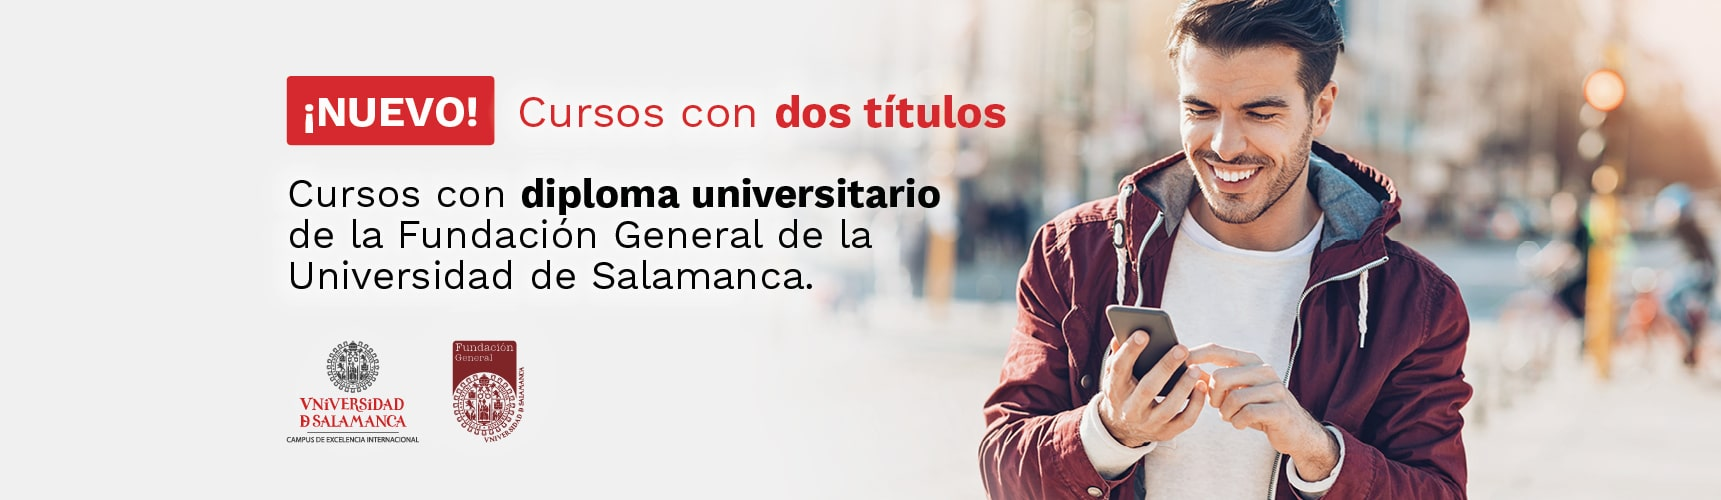 Nuevo acuerdo universitario